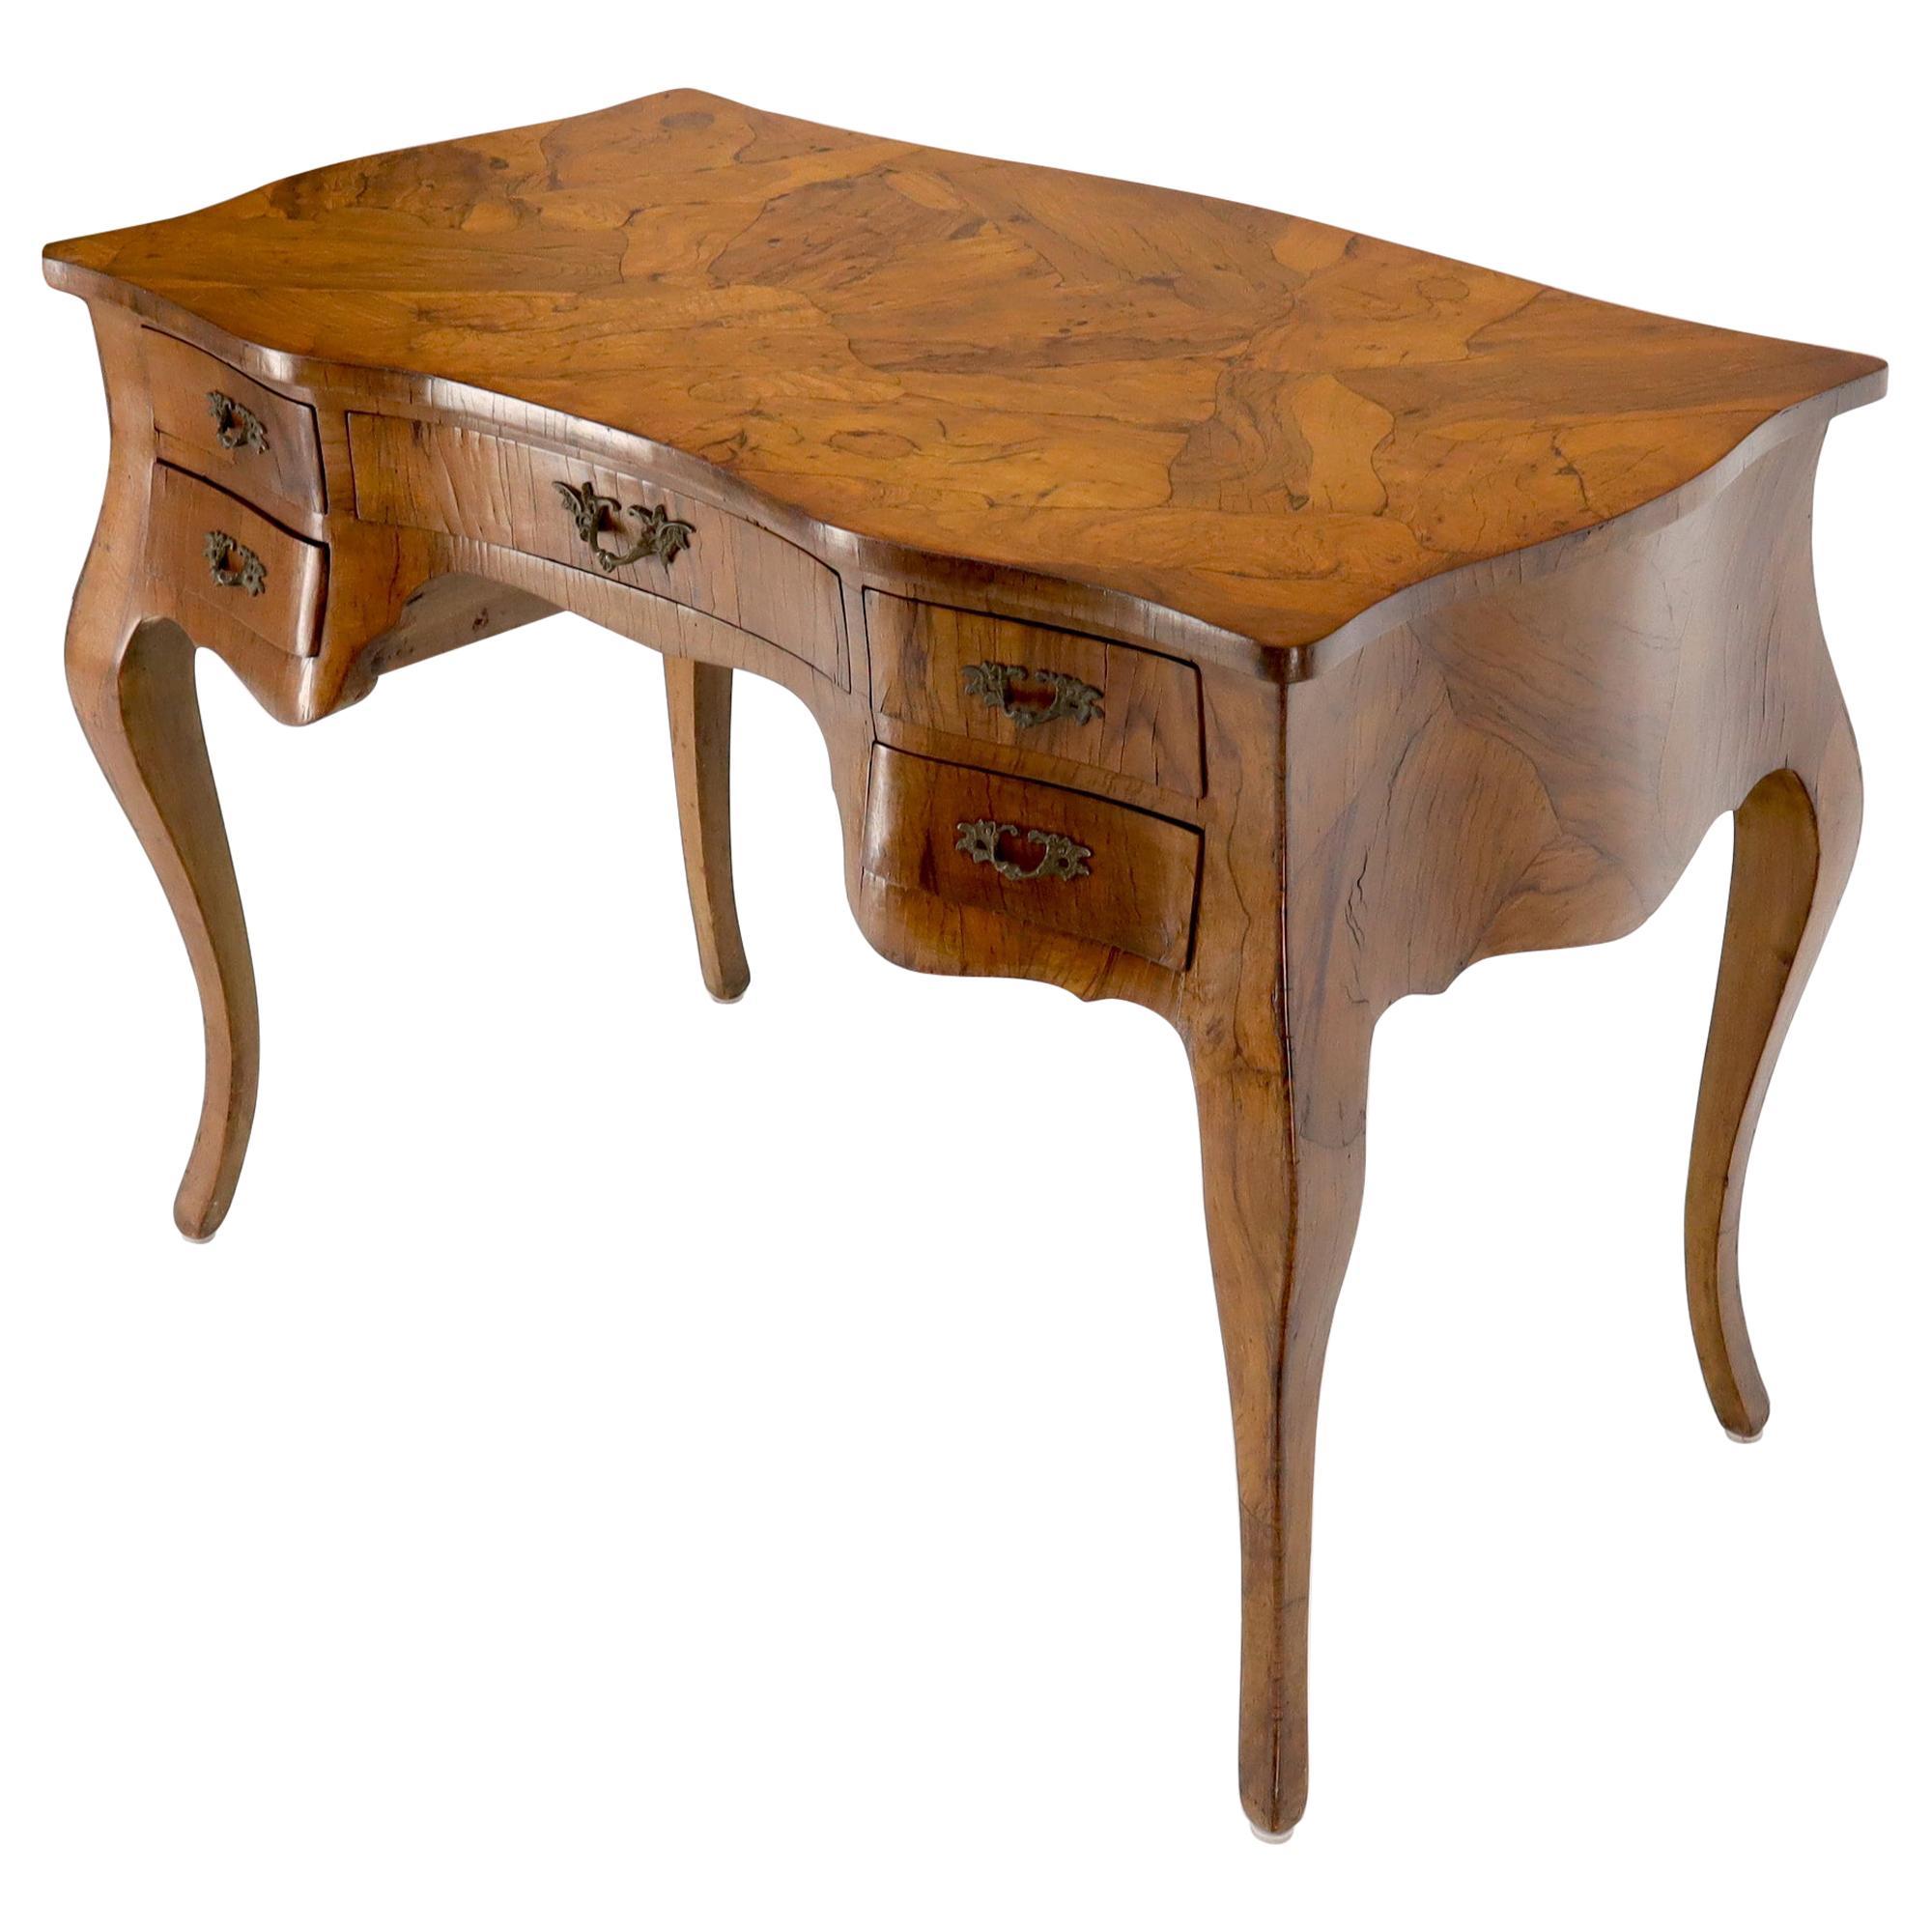 Olive Burl Wood Heavy Patches Veneer Italian Bombay Shape Desk Writing Table